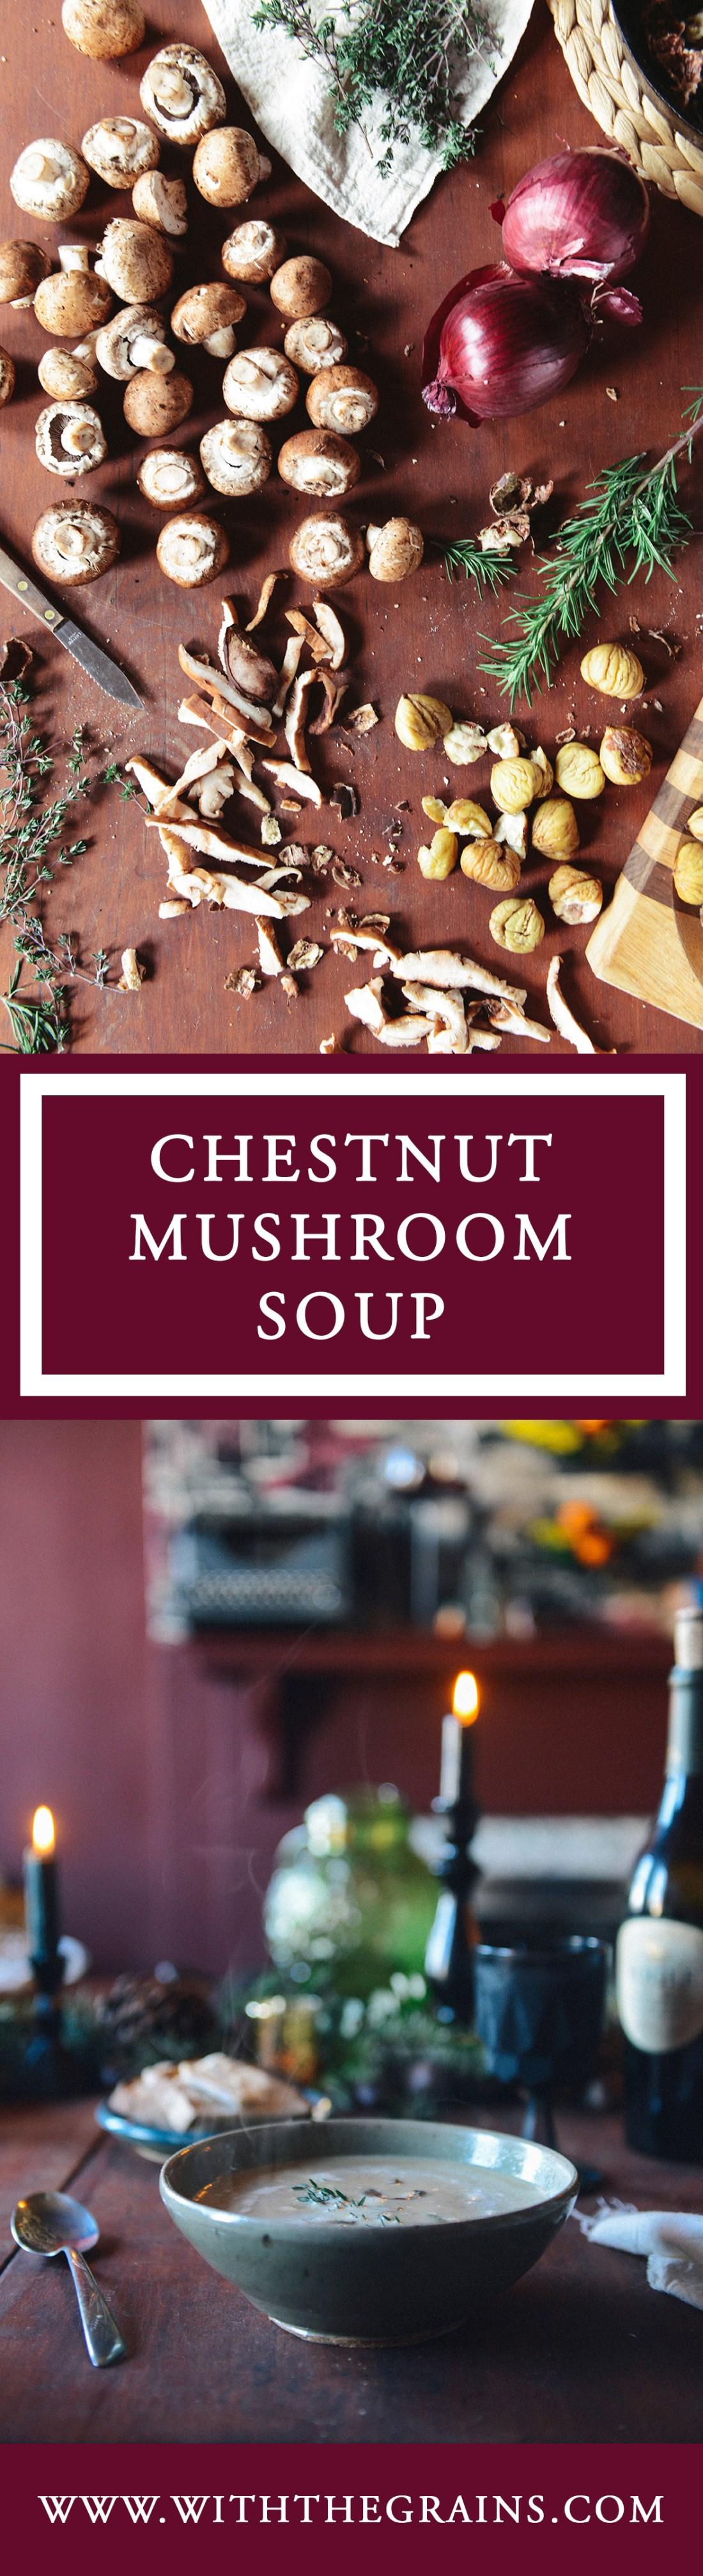 Creamy Chestnut & Mushroom Soup (Vegetarian) // www.WithTheGrains.com